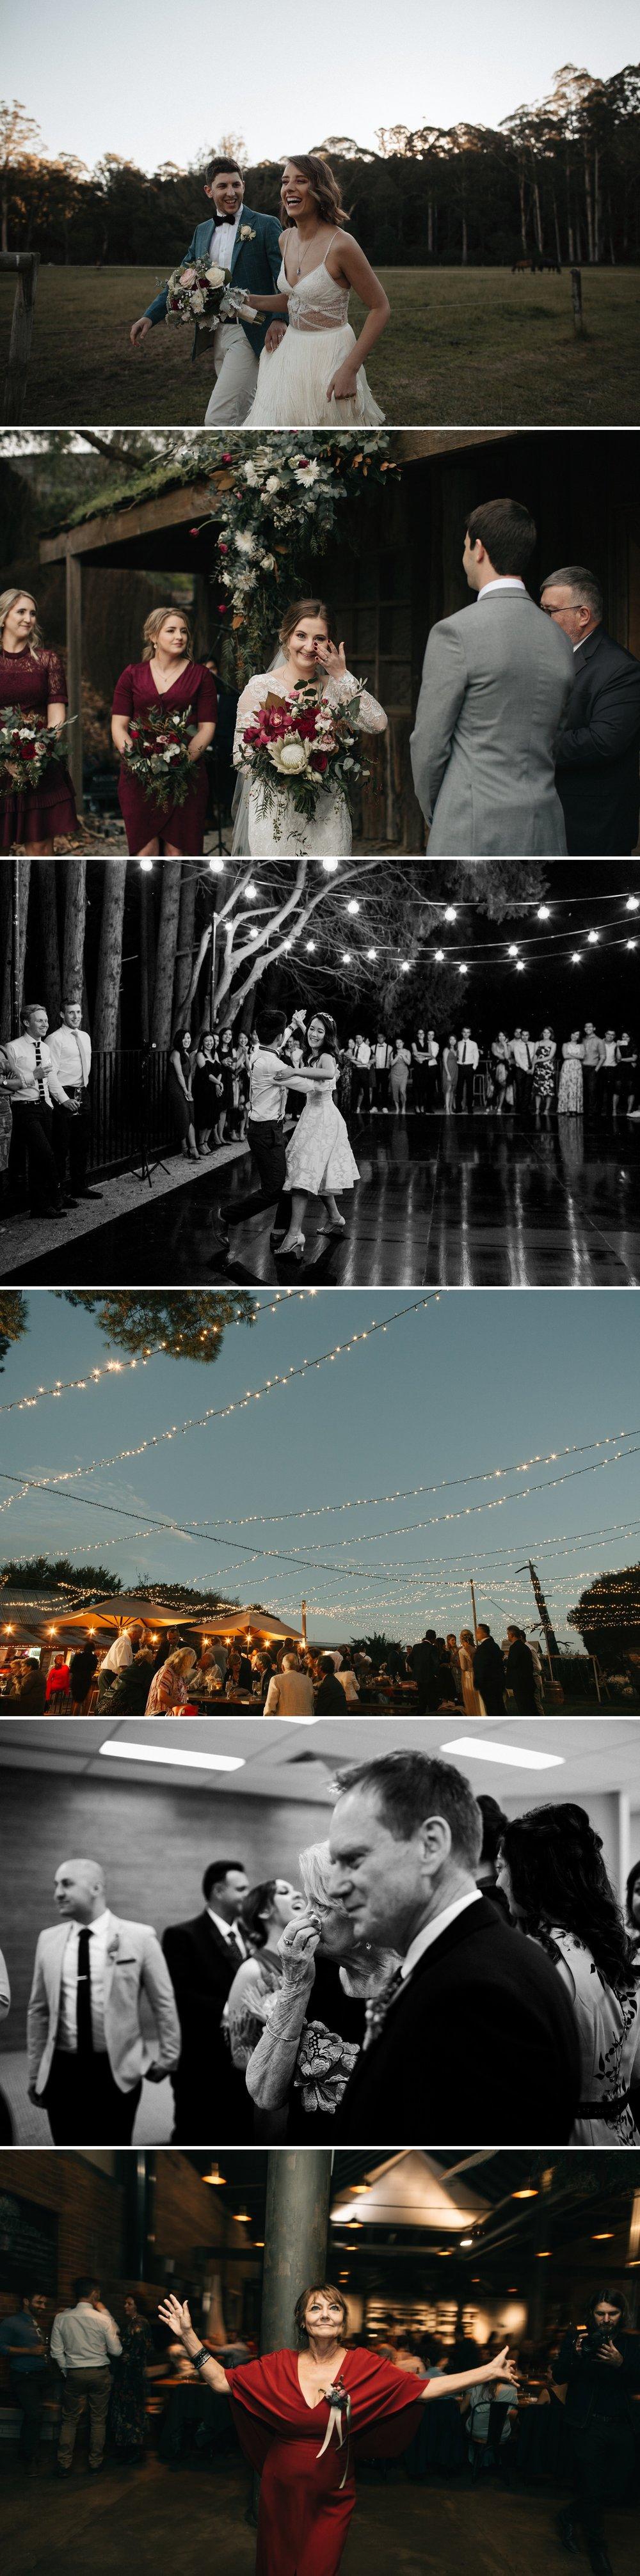 relaxed-wedding-photographer-melbourne_0023.jpg